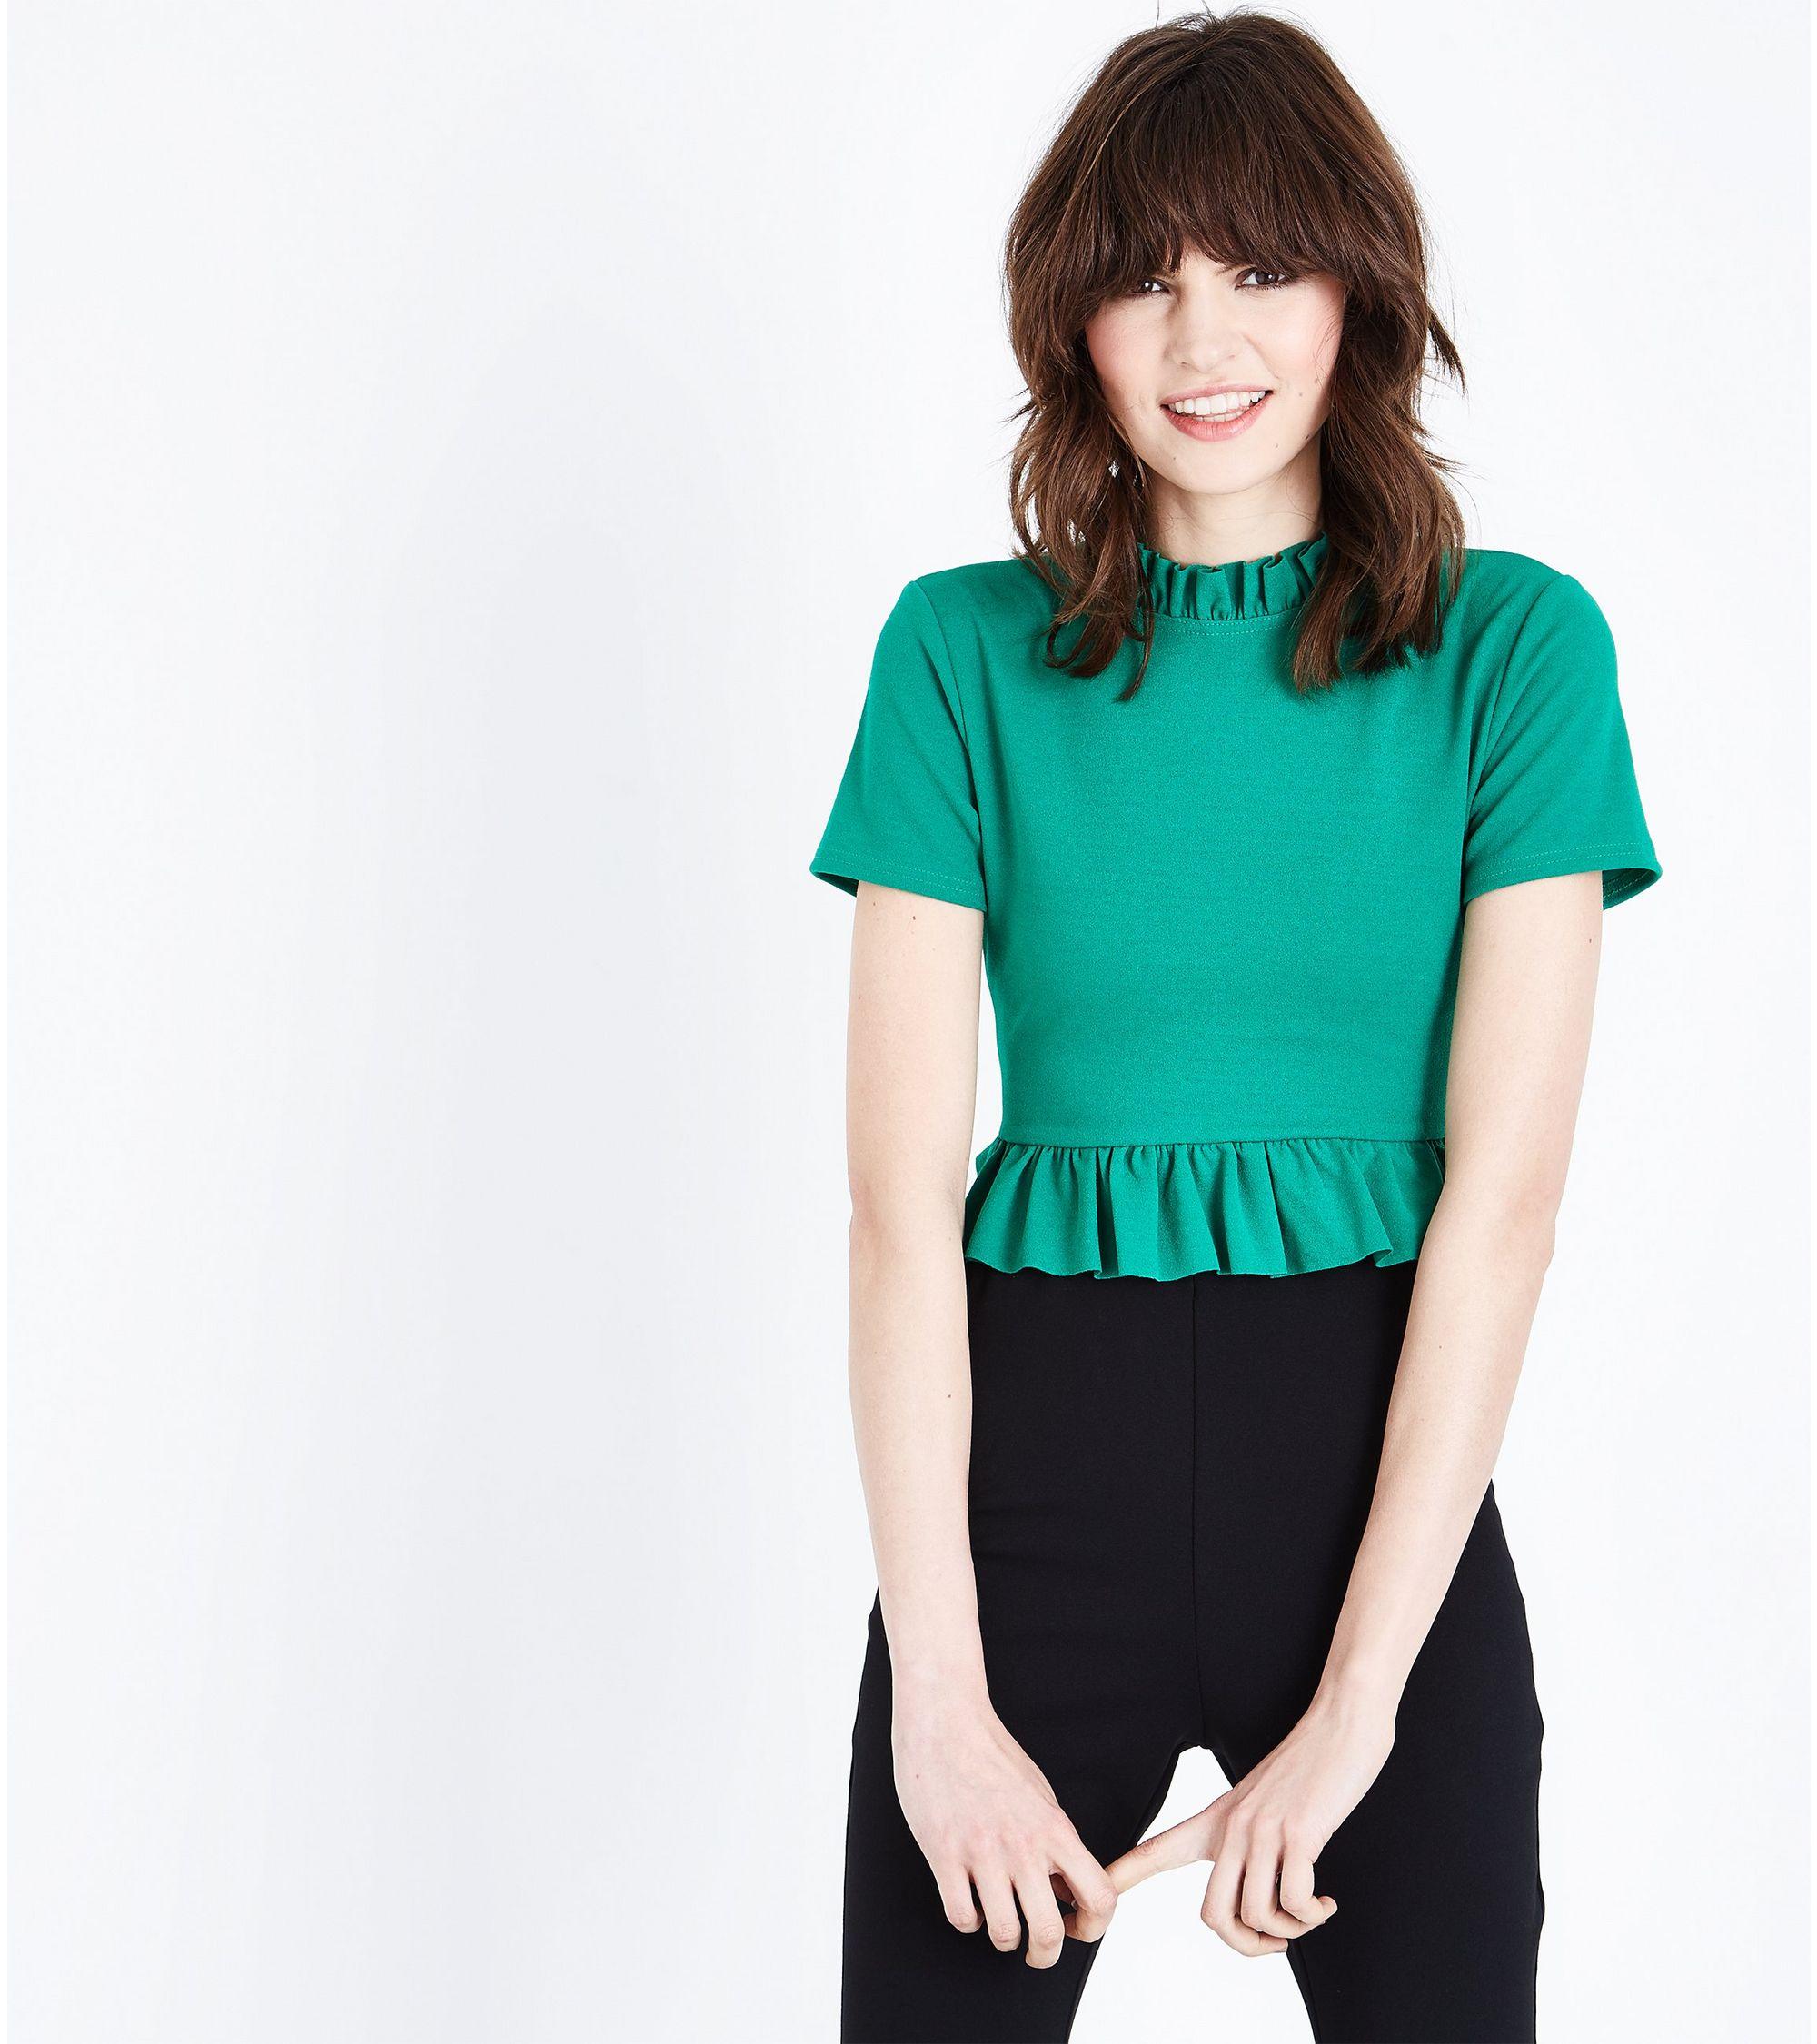 bbad58c46849b ... New Look - Cameo Rose Green Ruffle Trim Crop Top - 1 ...